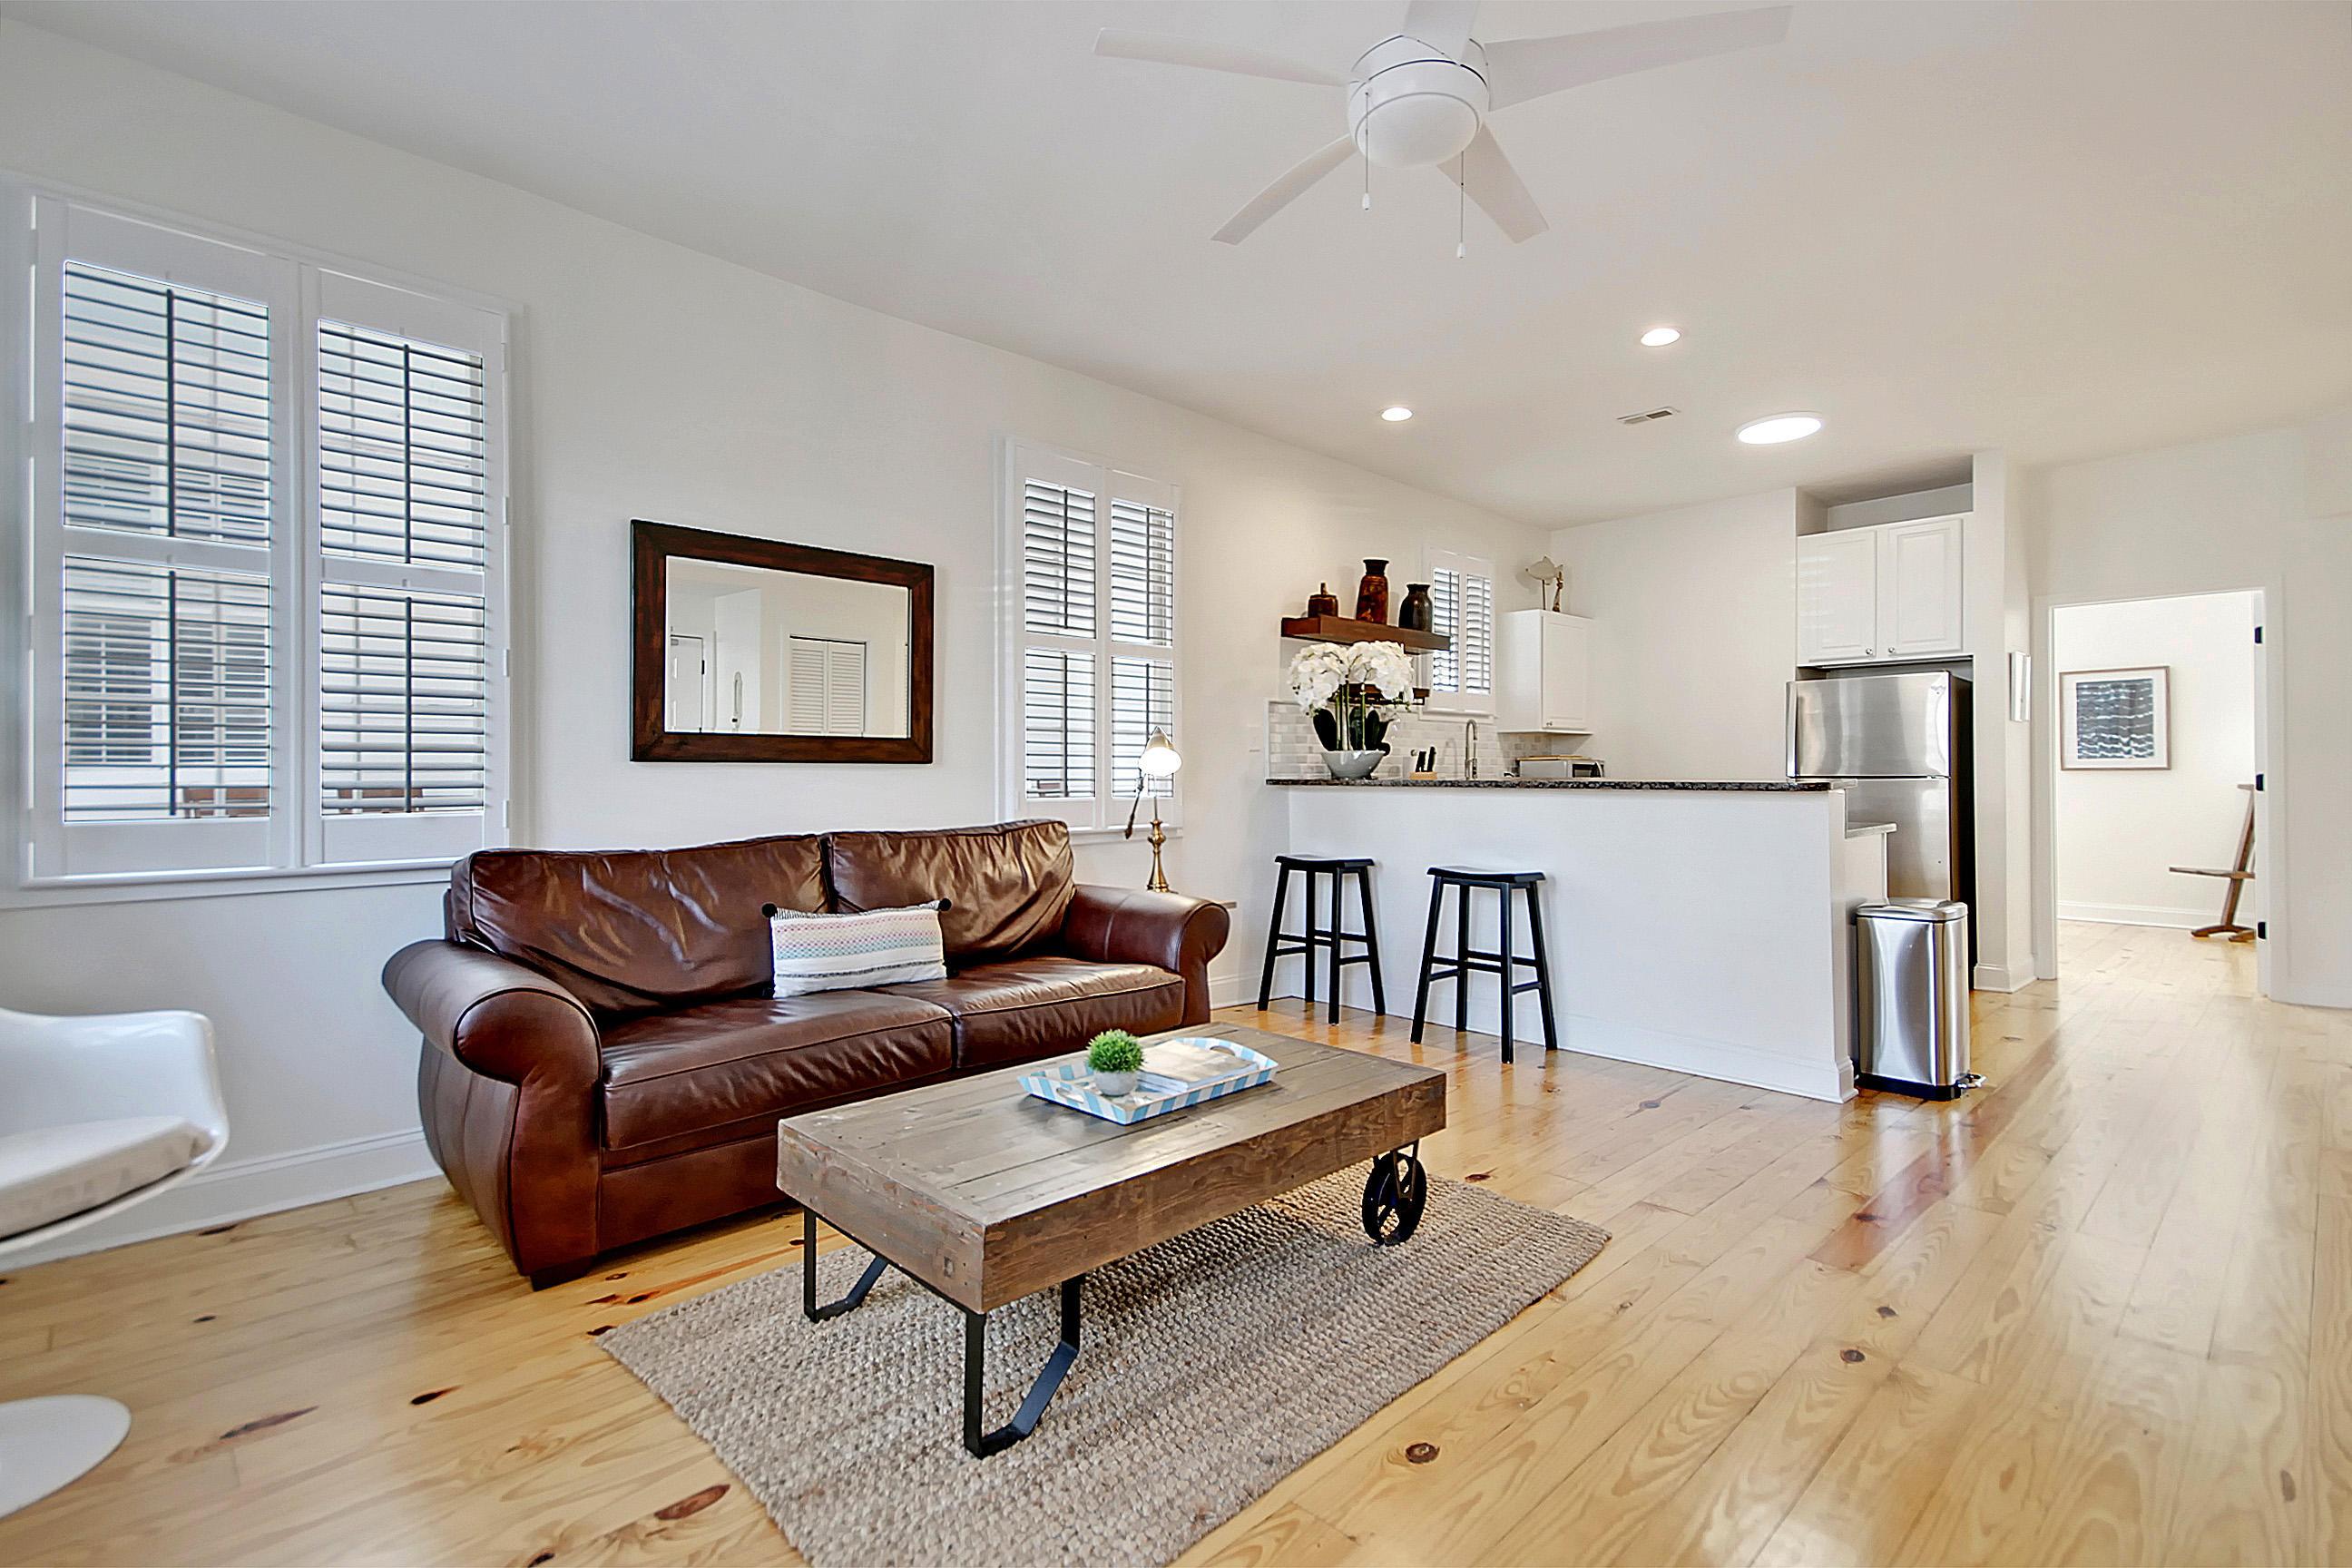 Cannonborough-Elliottborough Homes For Sale - 167 Spring, Charleston, SC - 12